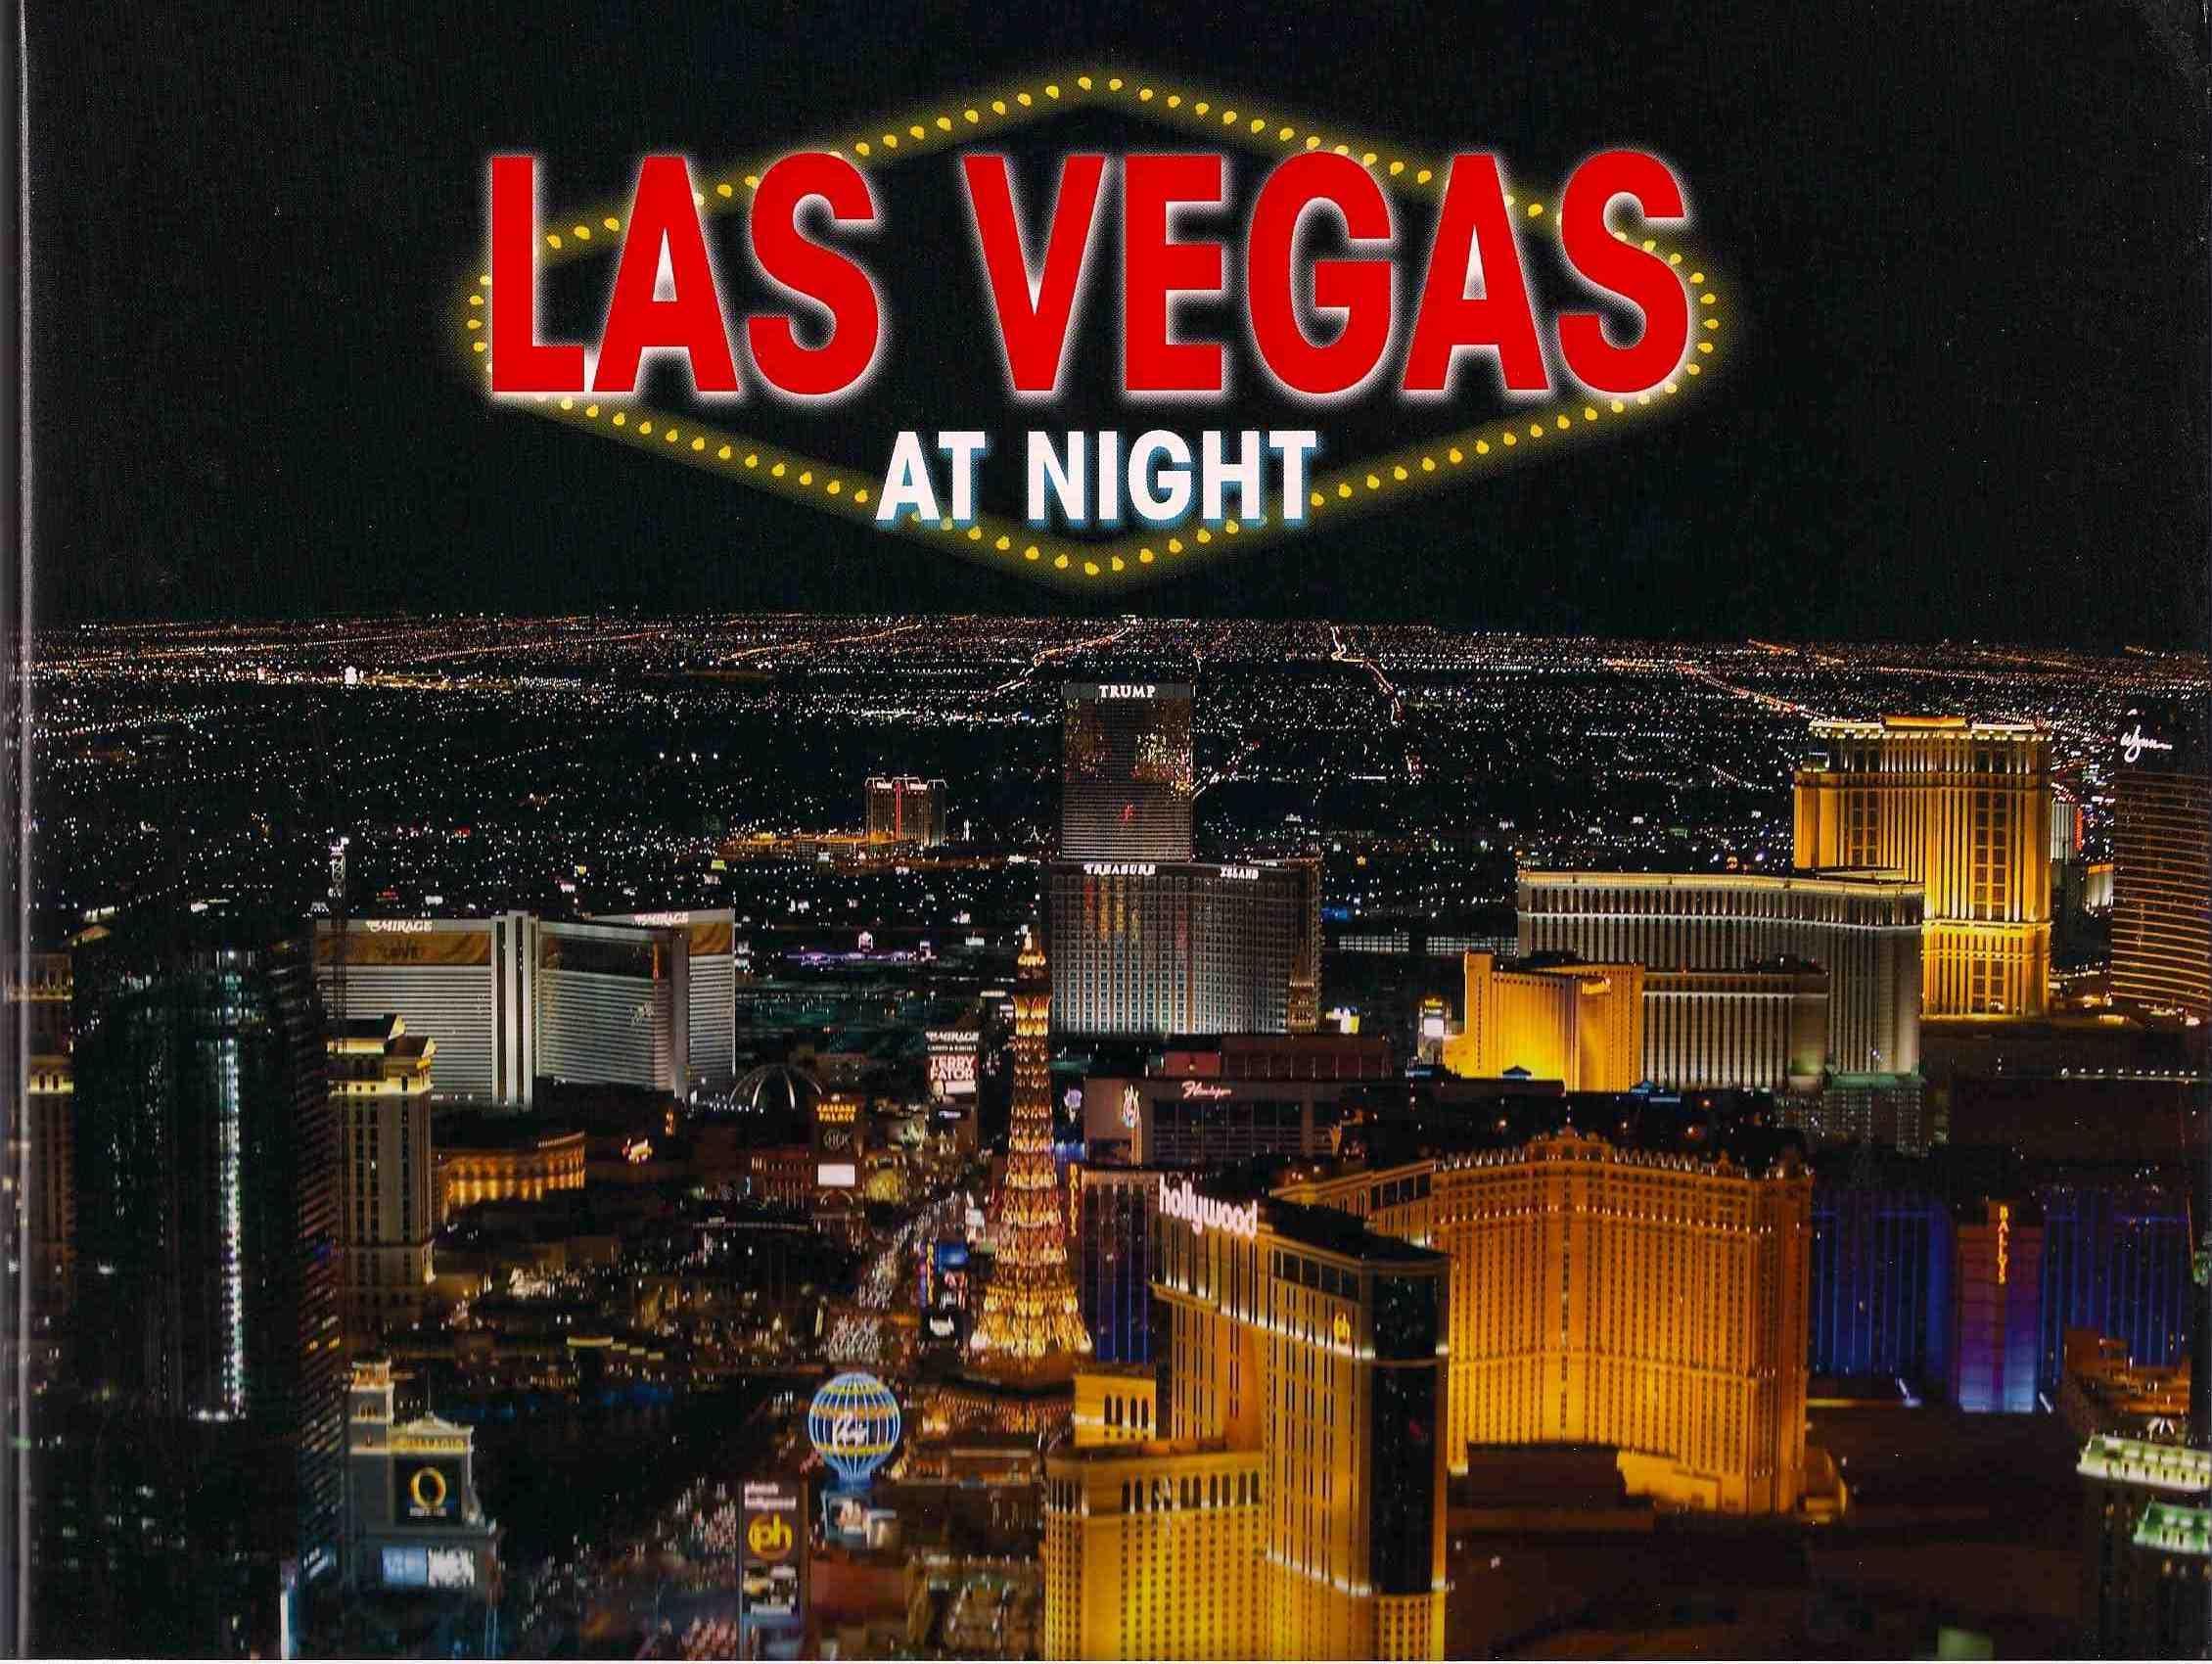 Las Vegas at Night (2009)